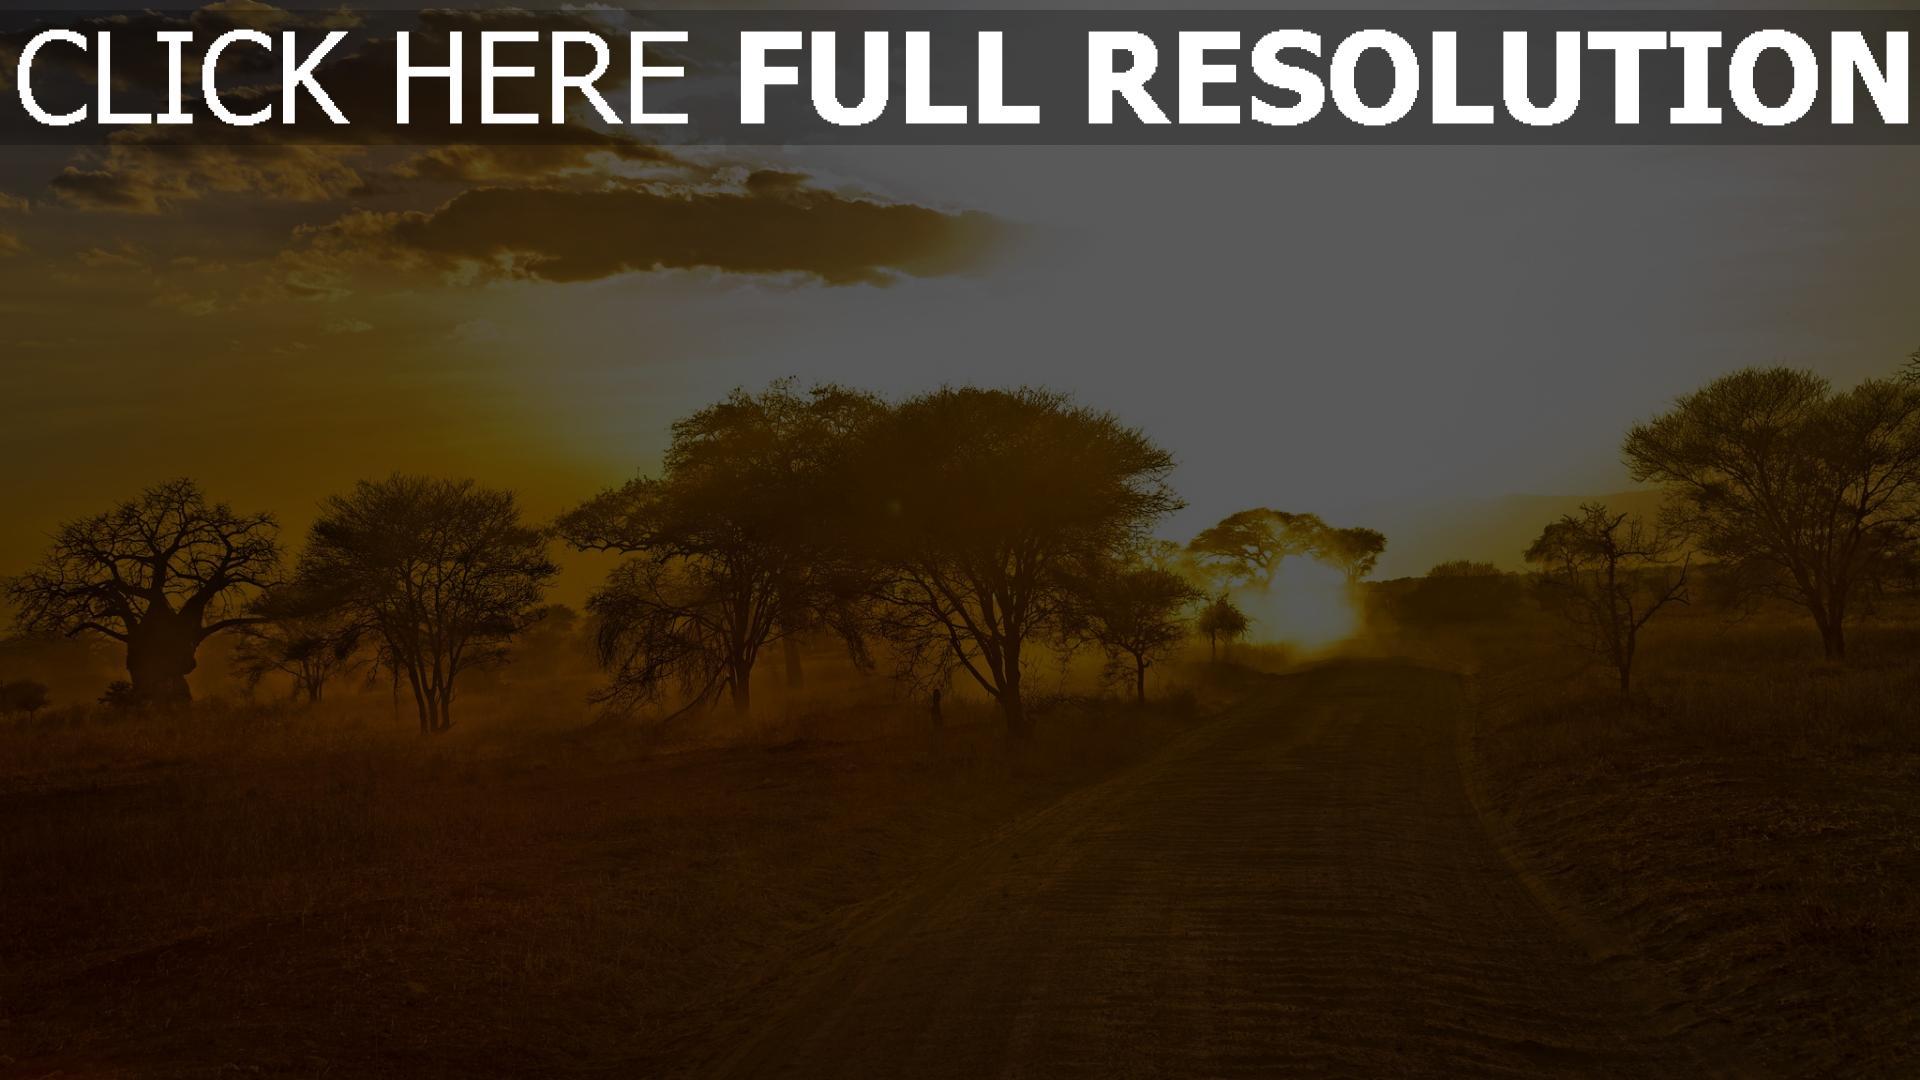 hd hintergrundbilder straße bäume sand afrika 1920x1080